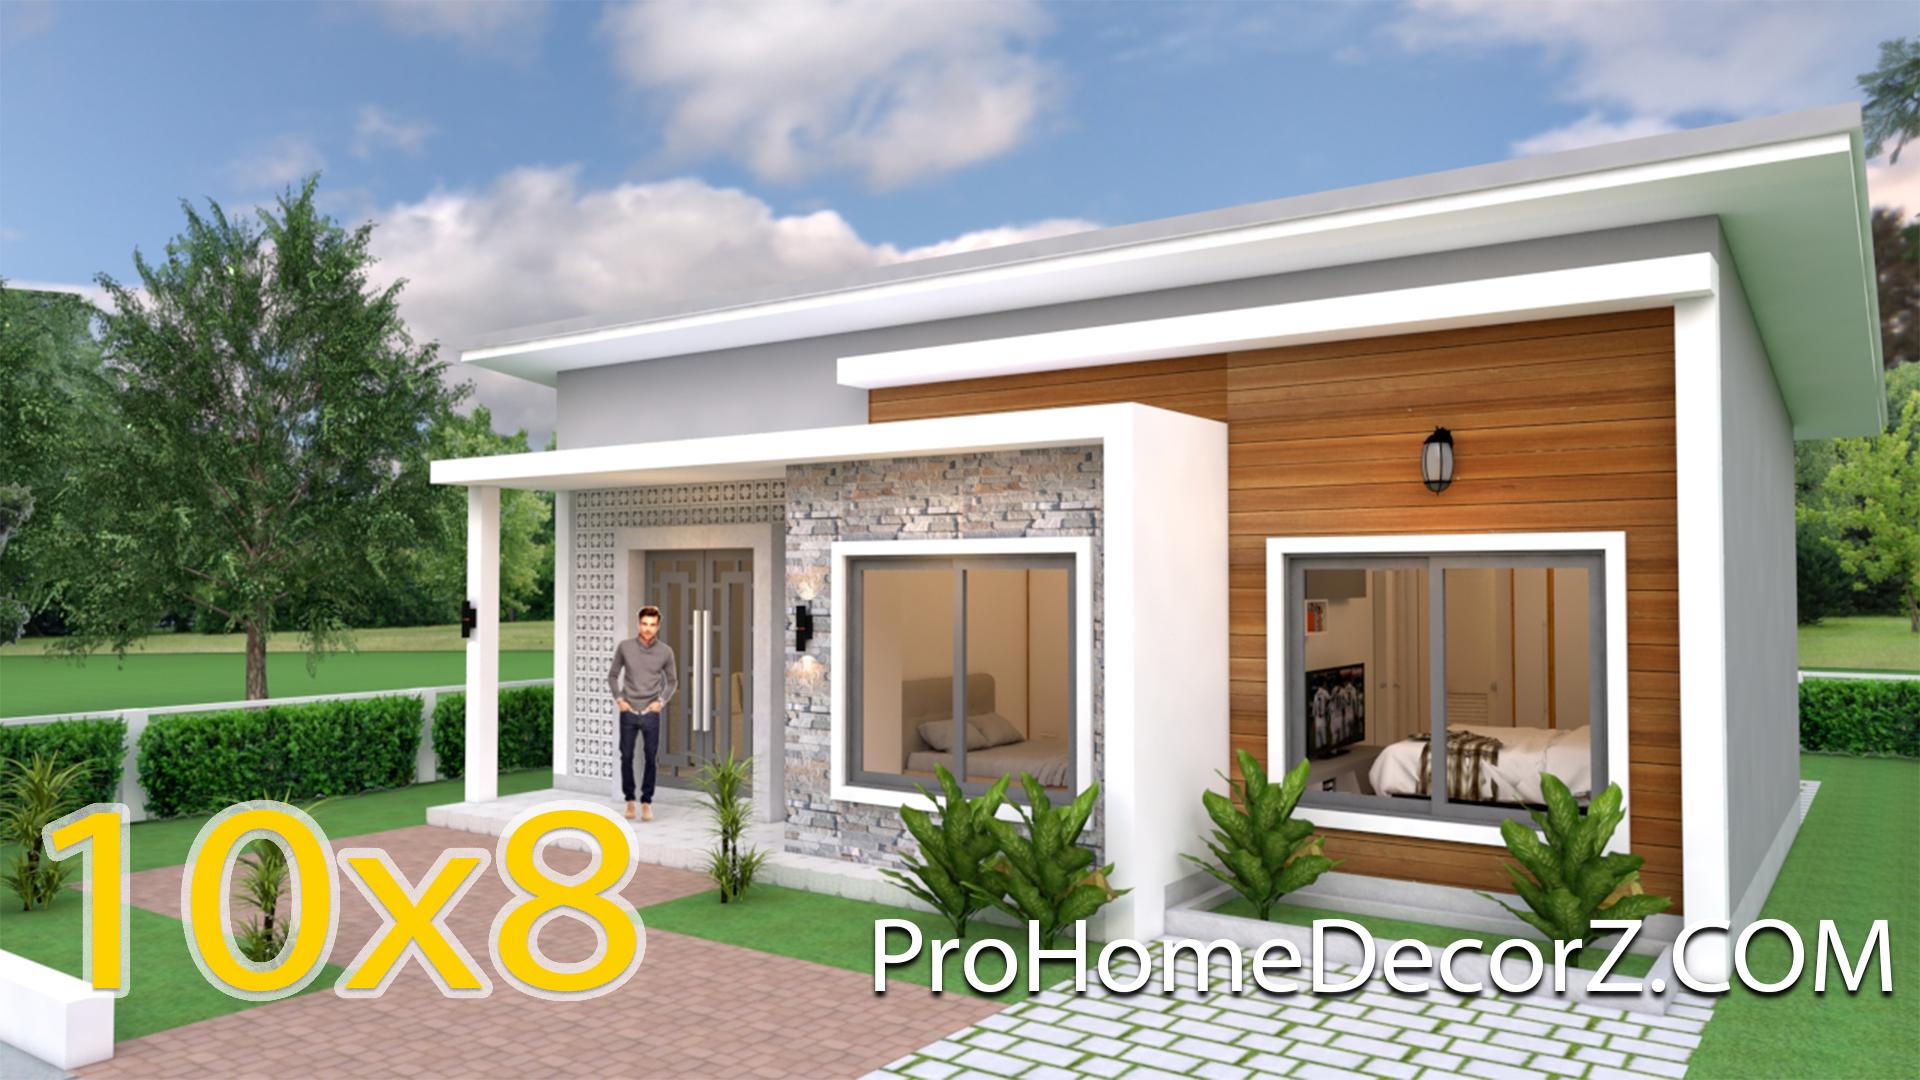 Simple House Design 10x8 Meter 27x34 Feet Pro Home Decors